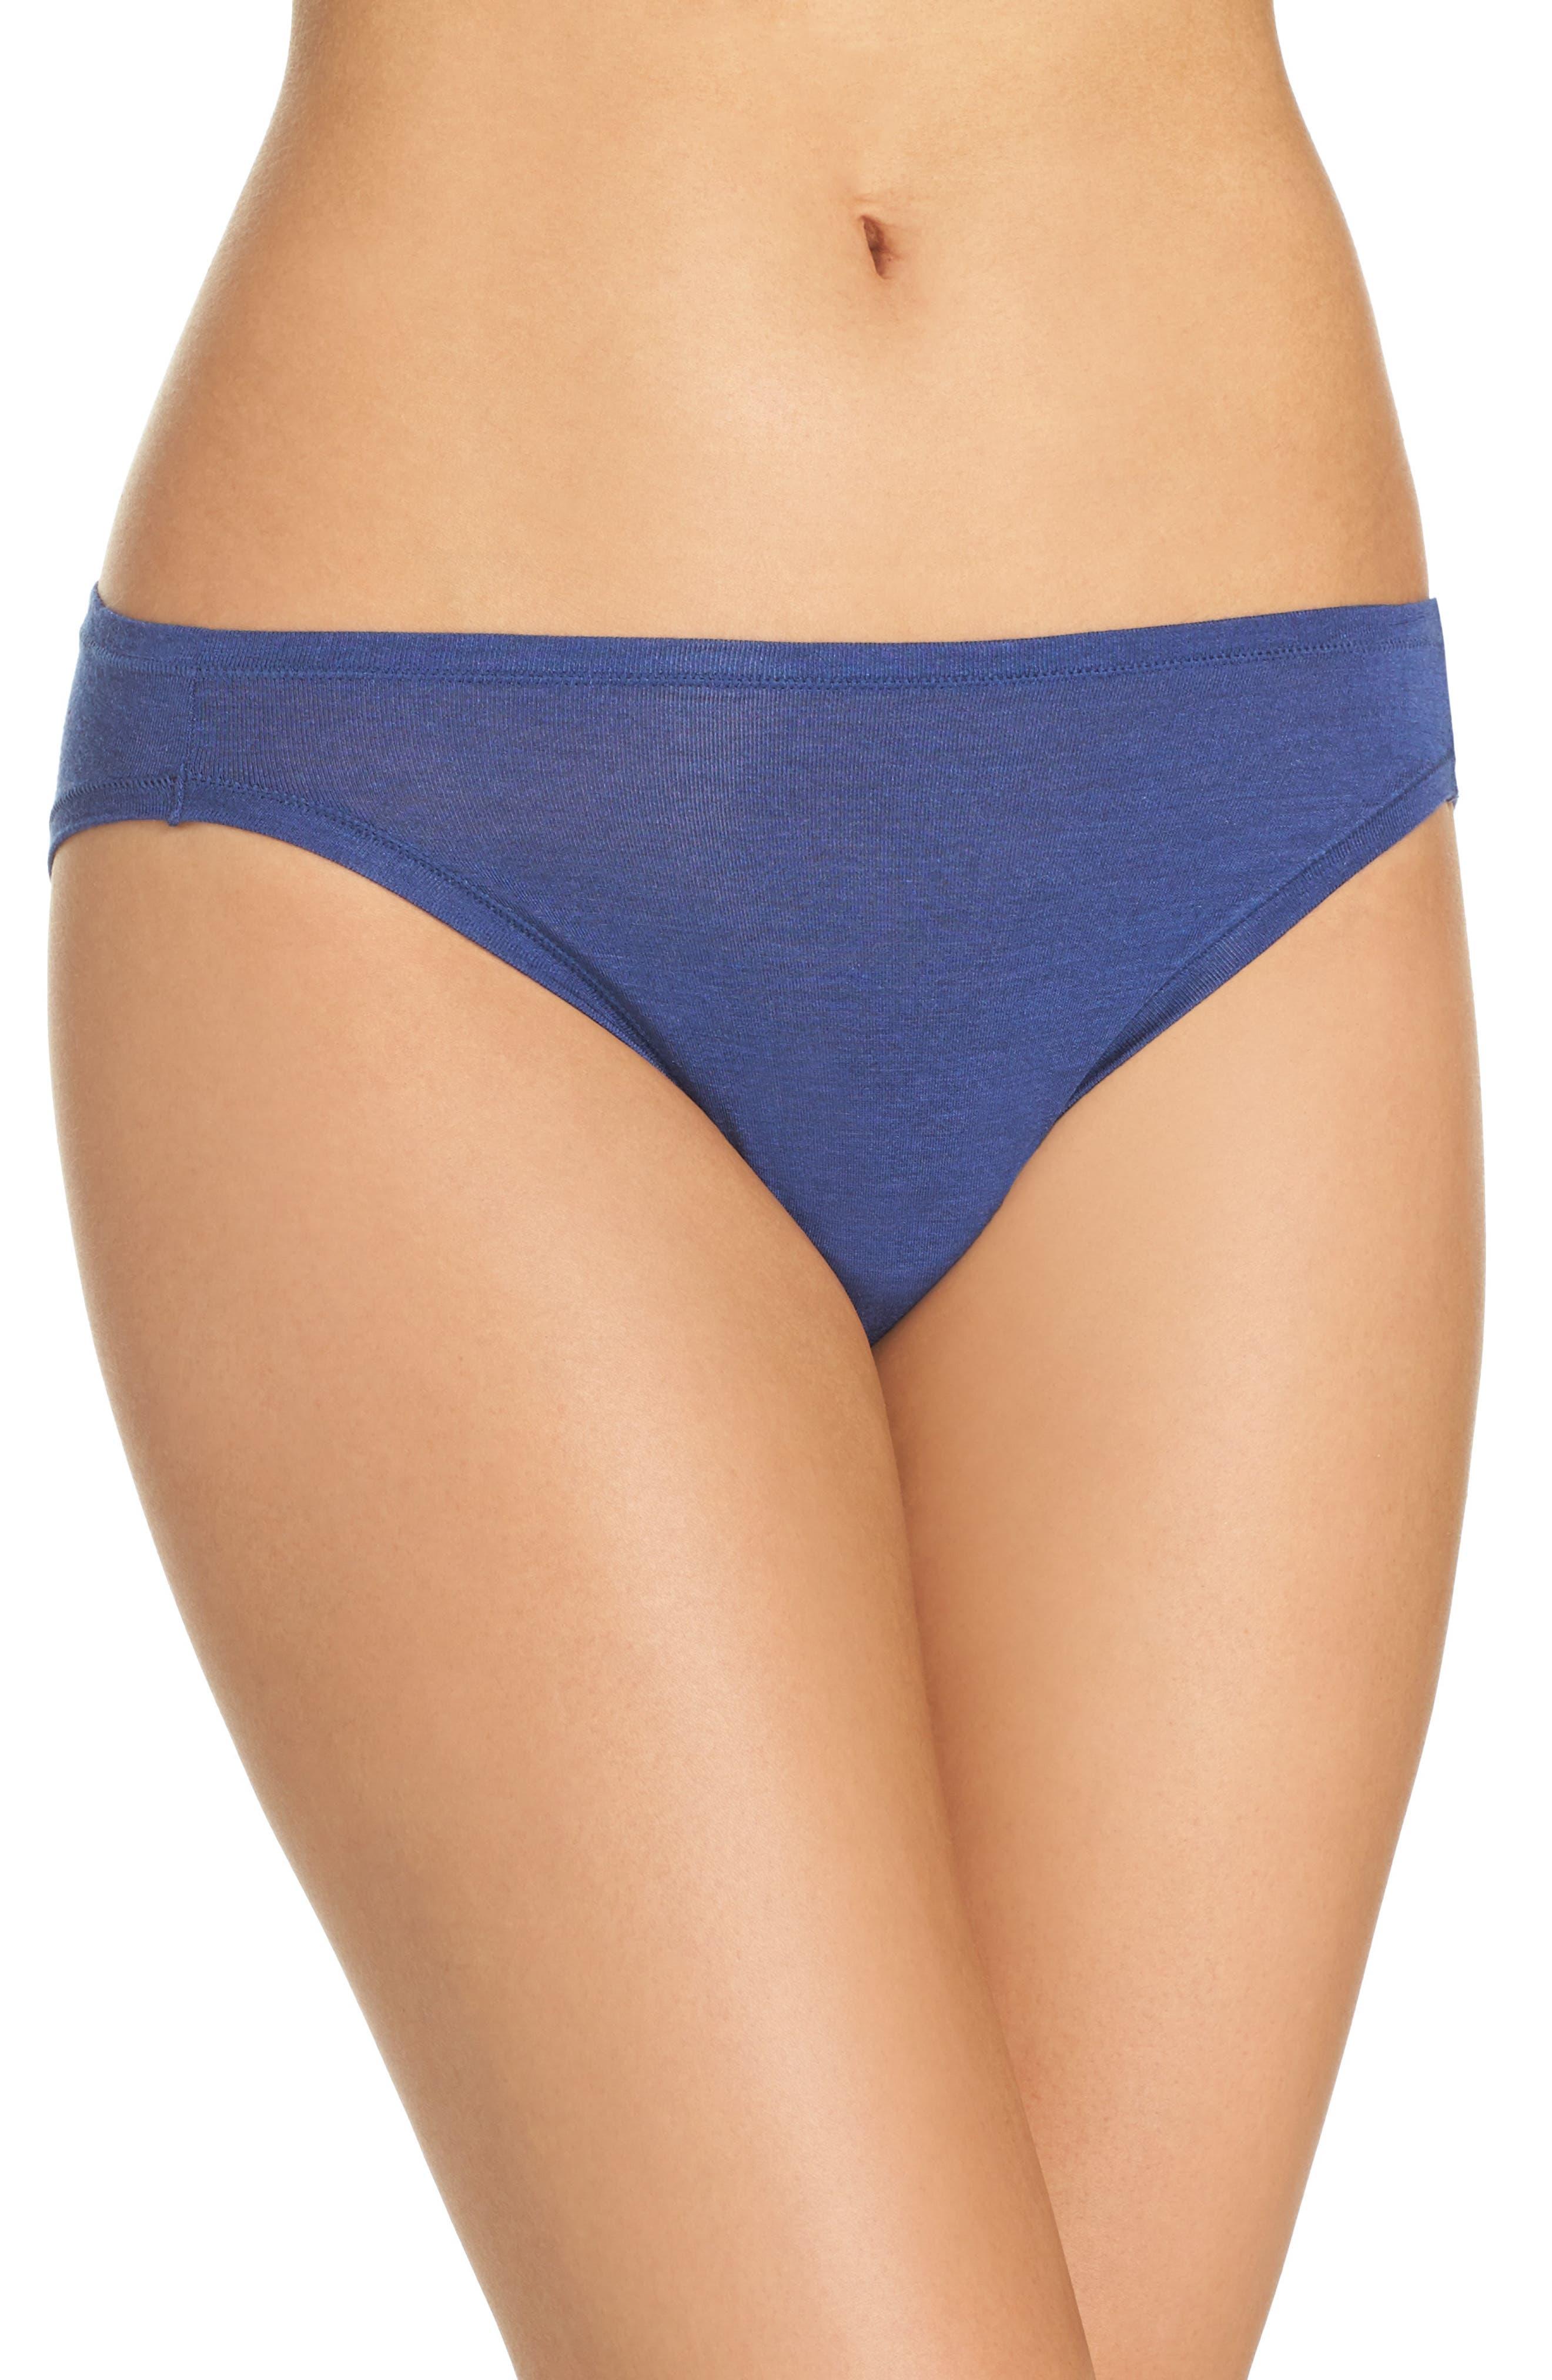 Bliss Essence Bikini,                         Main,                         color, 400